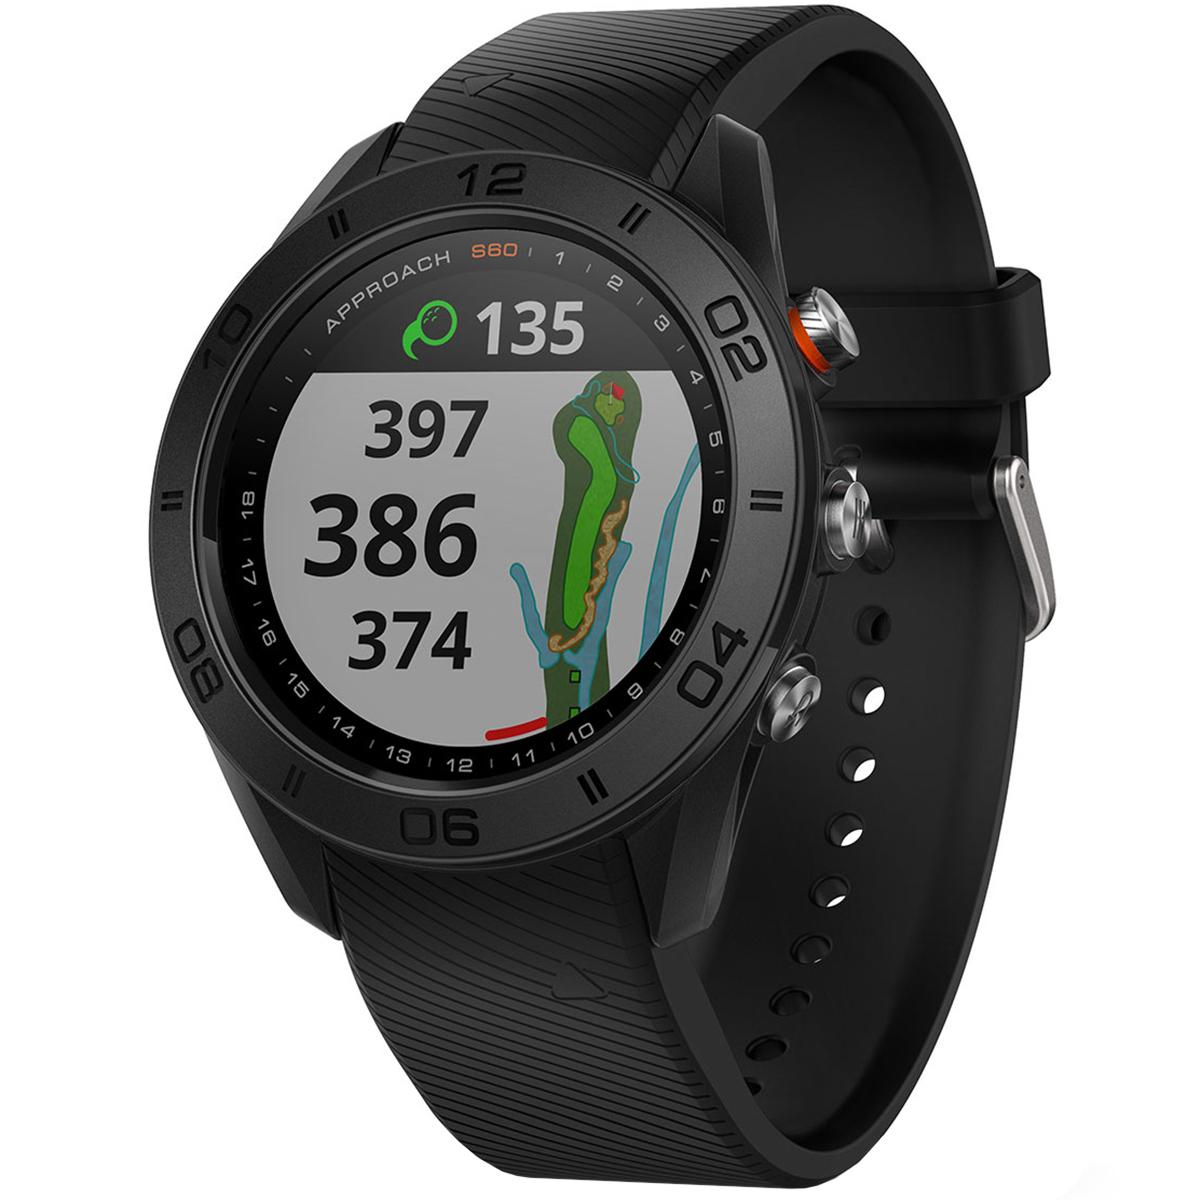 Garmin Approach S60 GPS Watch  golf way h £299.99 American Golf